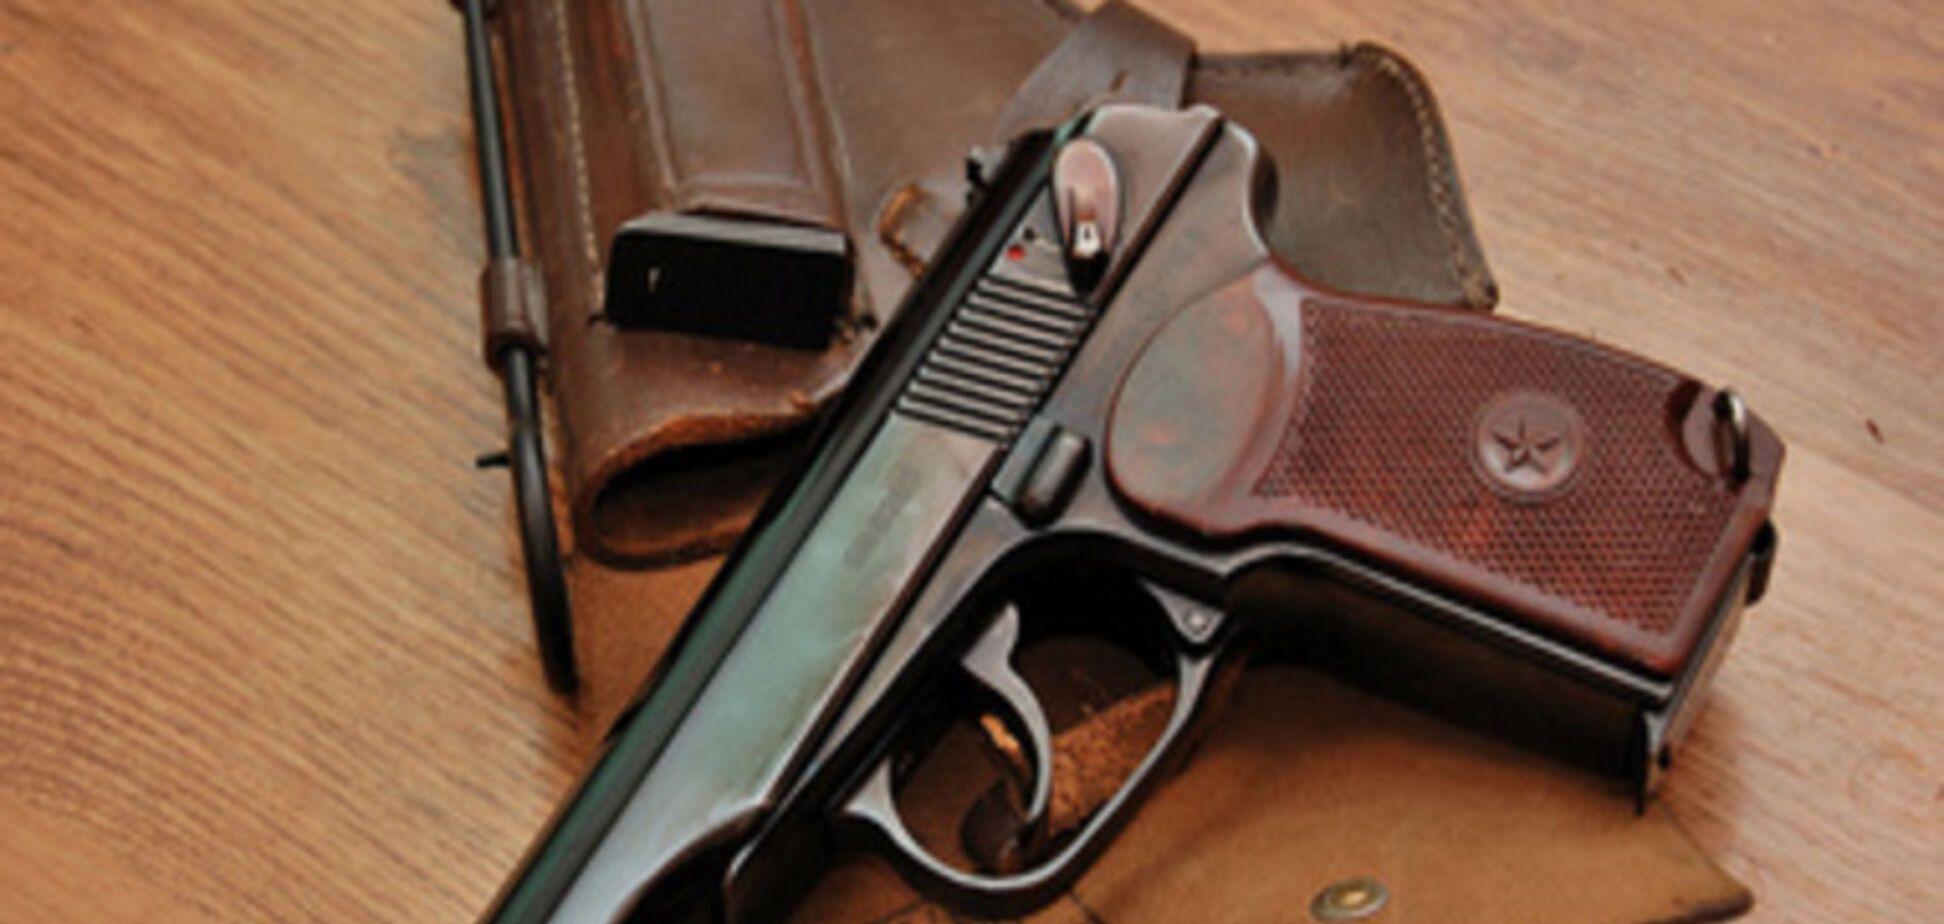 На Запорожье милицейский спецназовец прострелил себе грудь